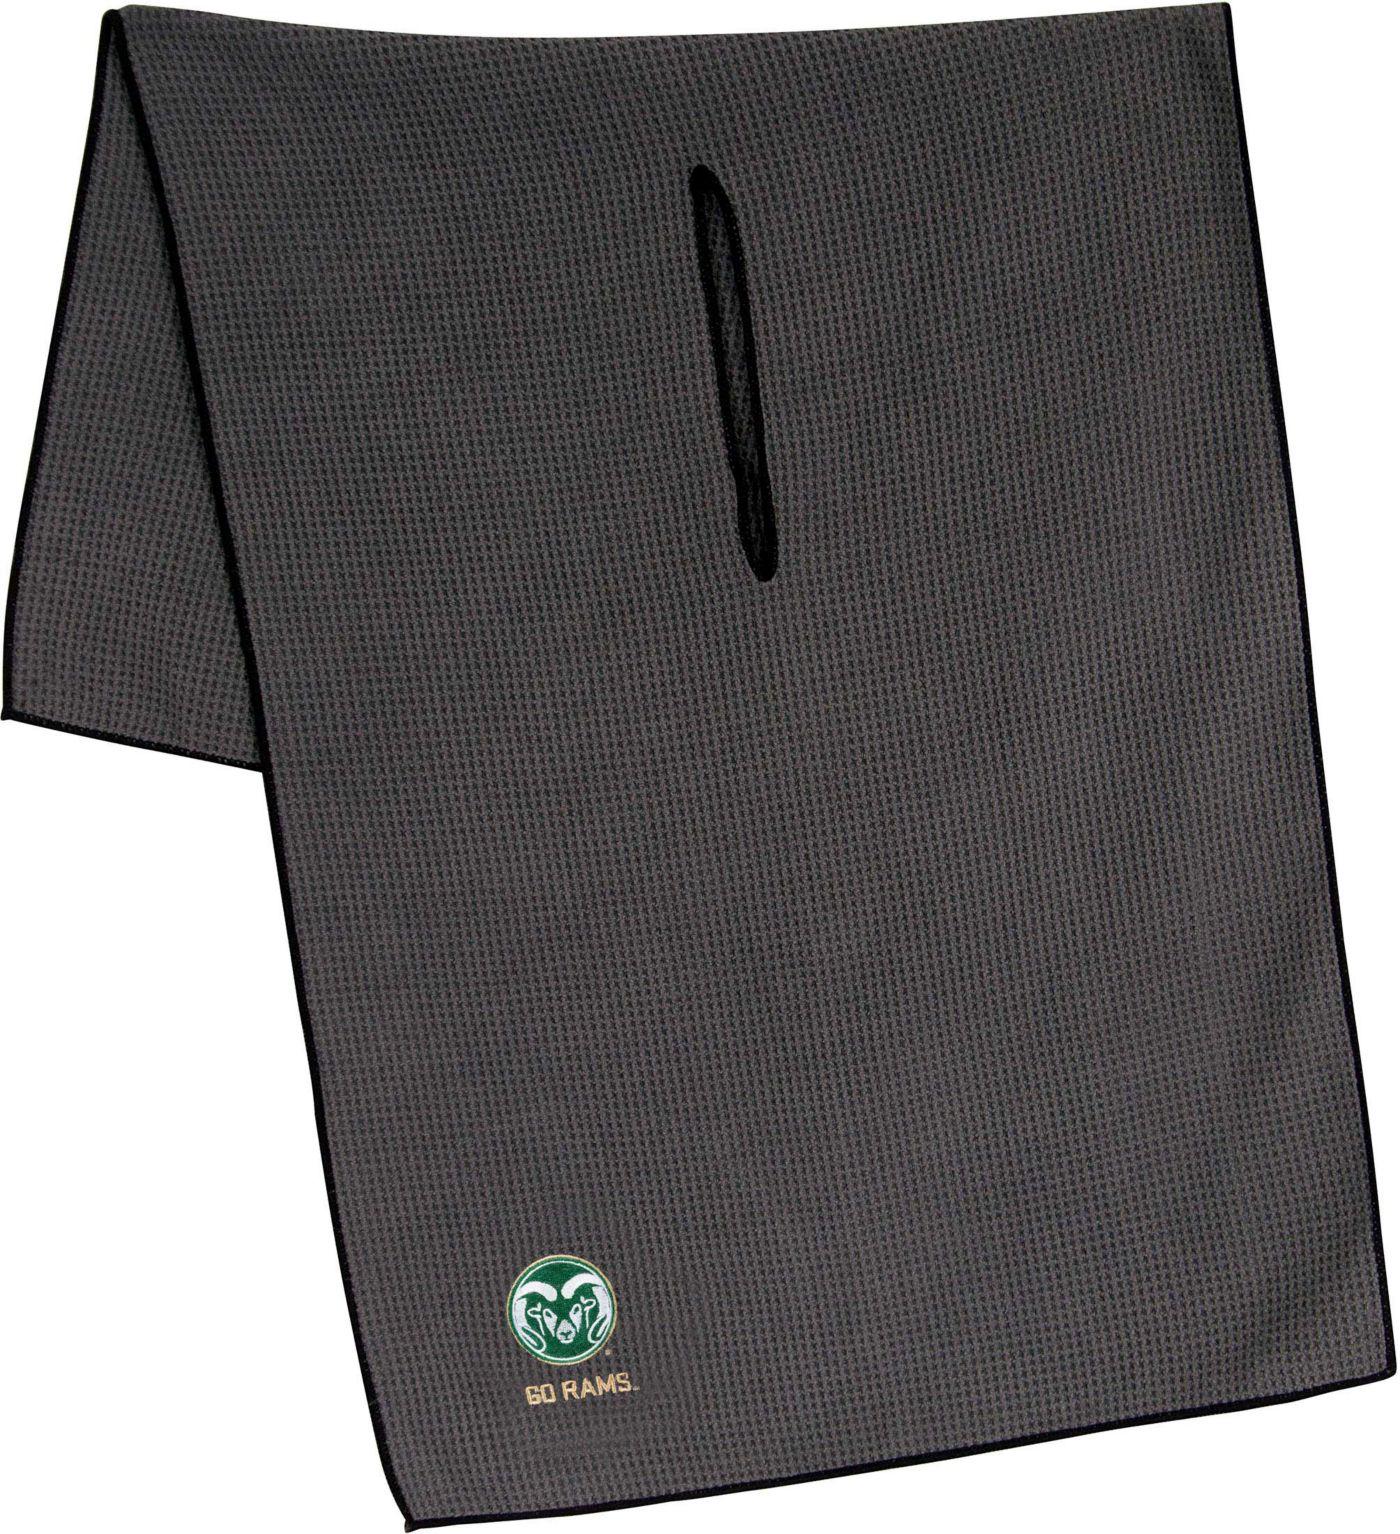 "Team Effort Colorado State Rams 19"" x 41"" Microfiber Golf Towel"